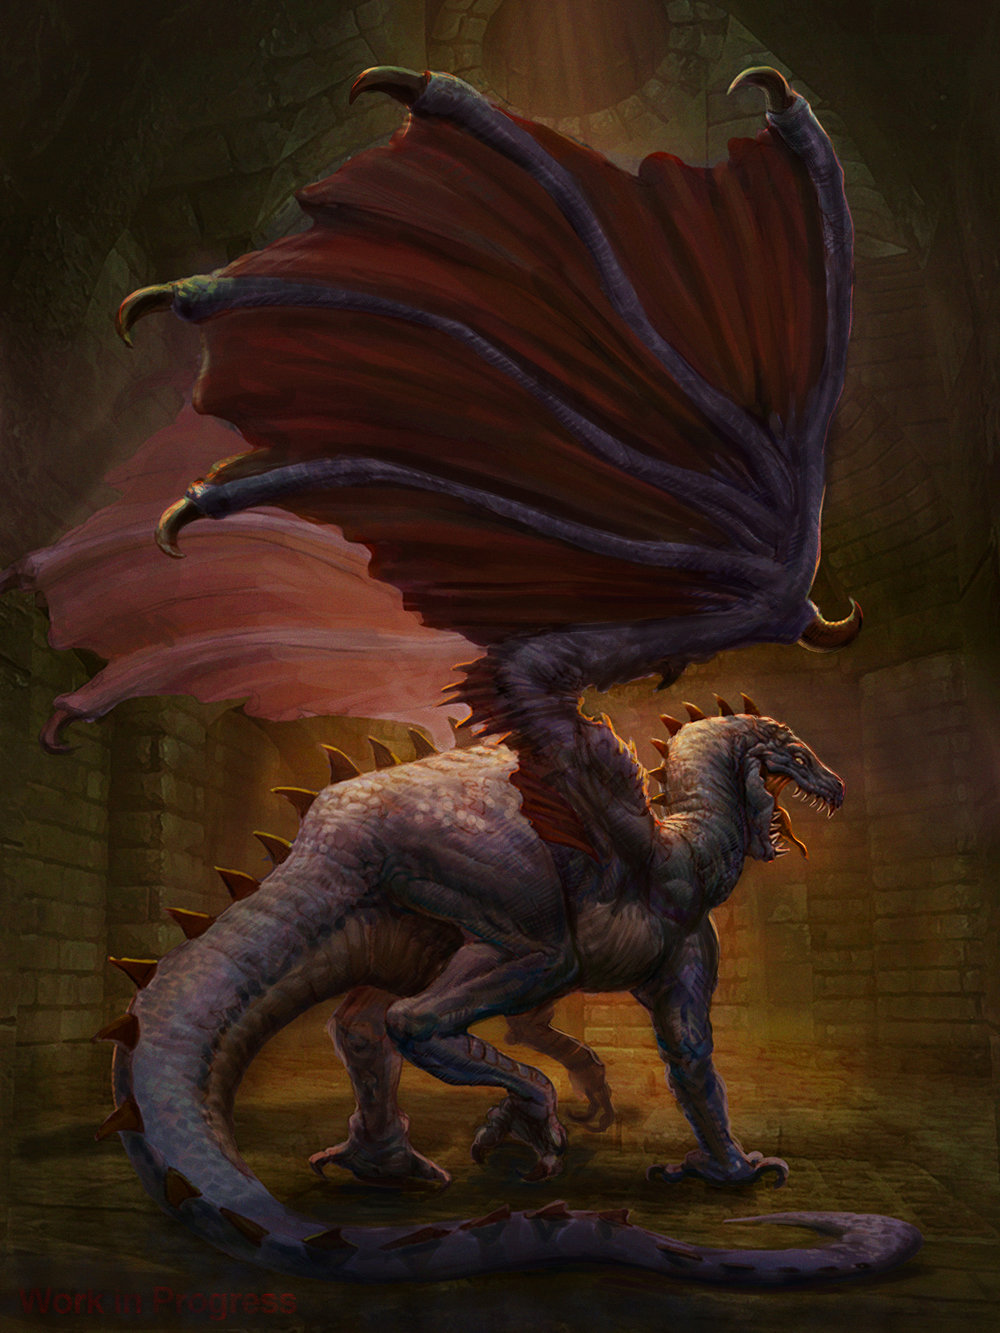 Dragon_wip.jpg